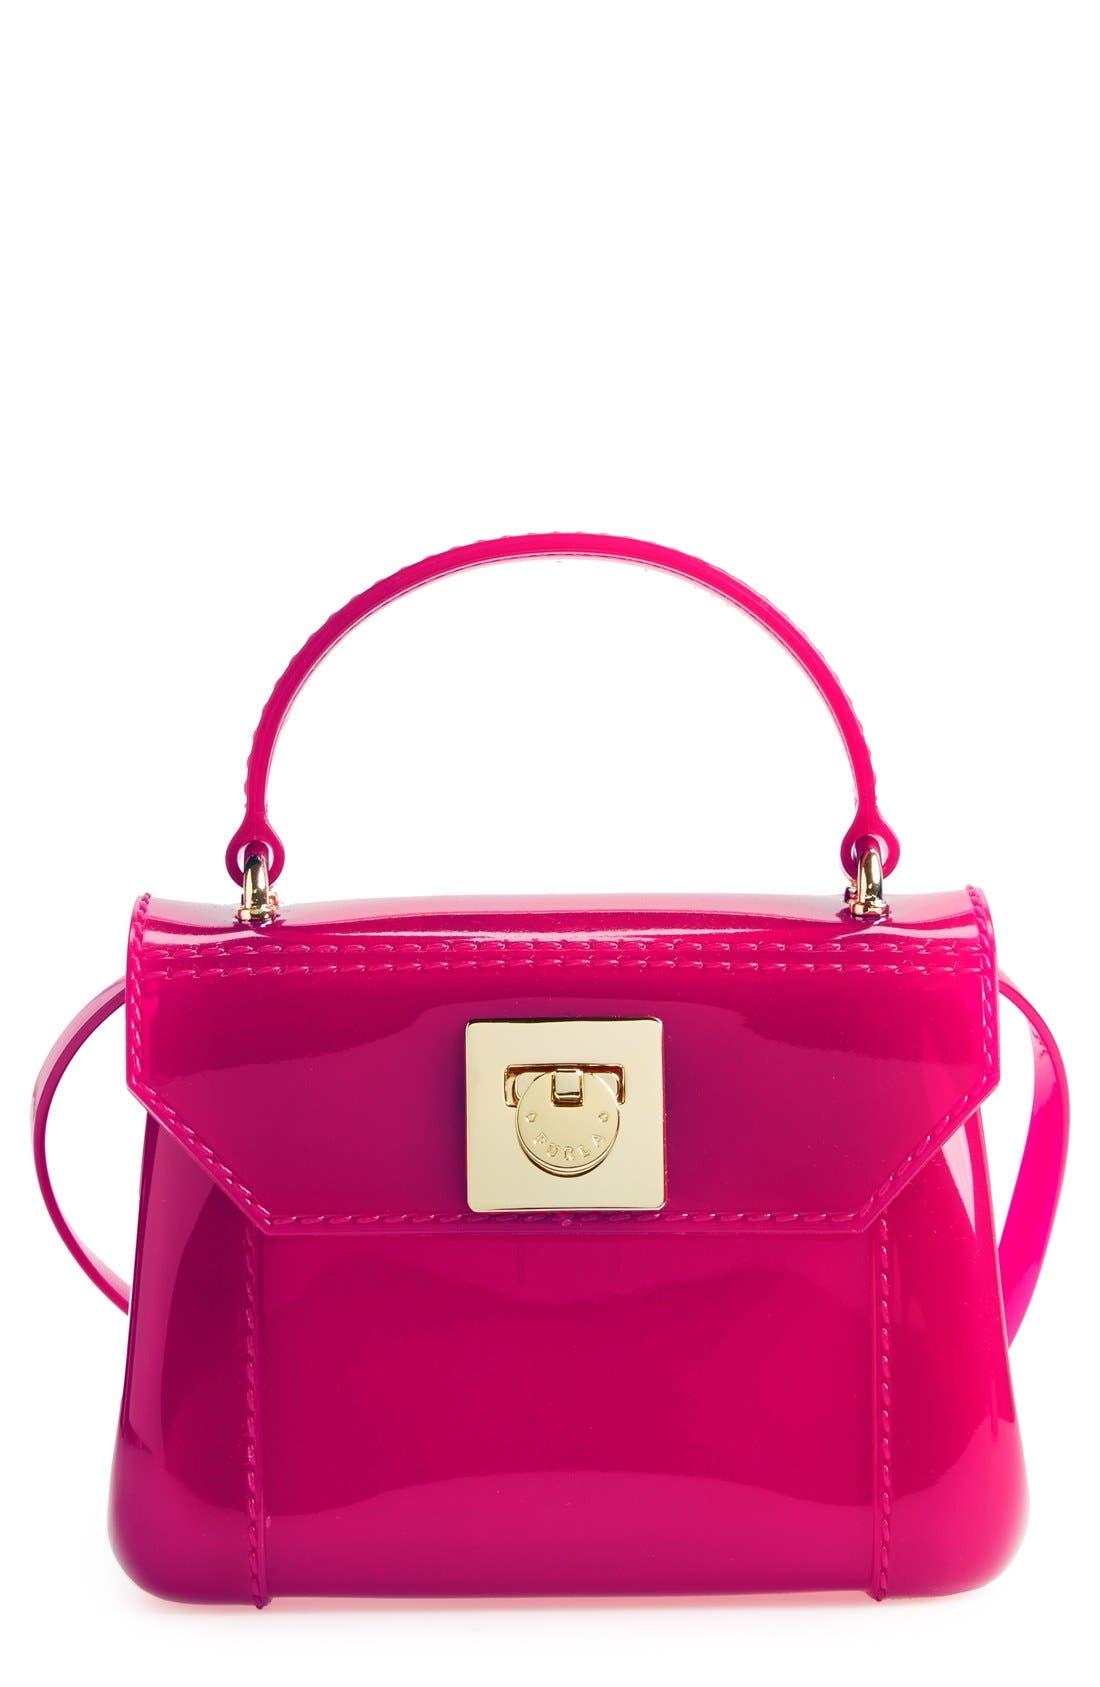 Alternate Image 1 Selected - Furla 'Candy - Mini' Top Handle Crossbody Bag